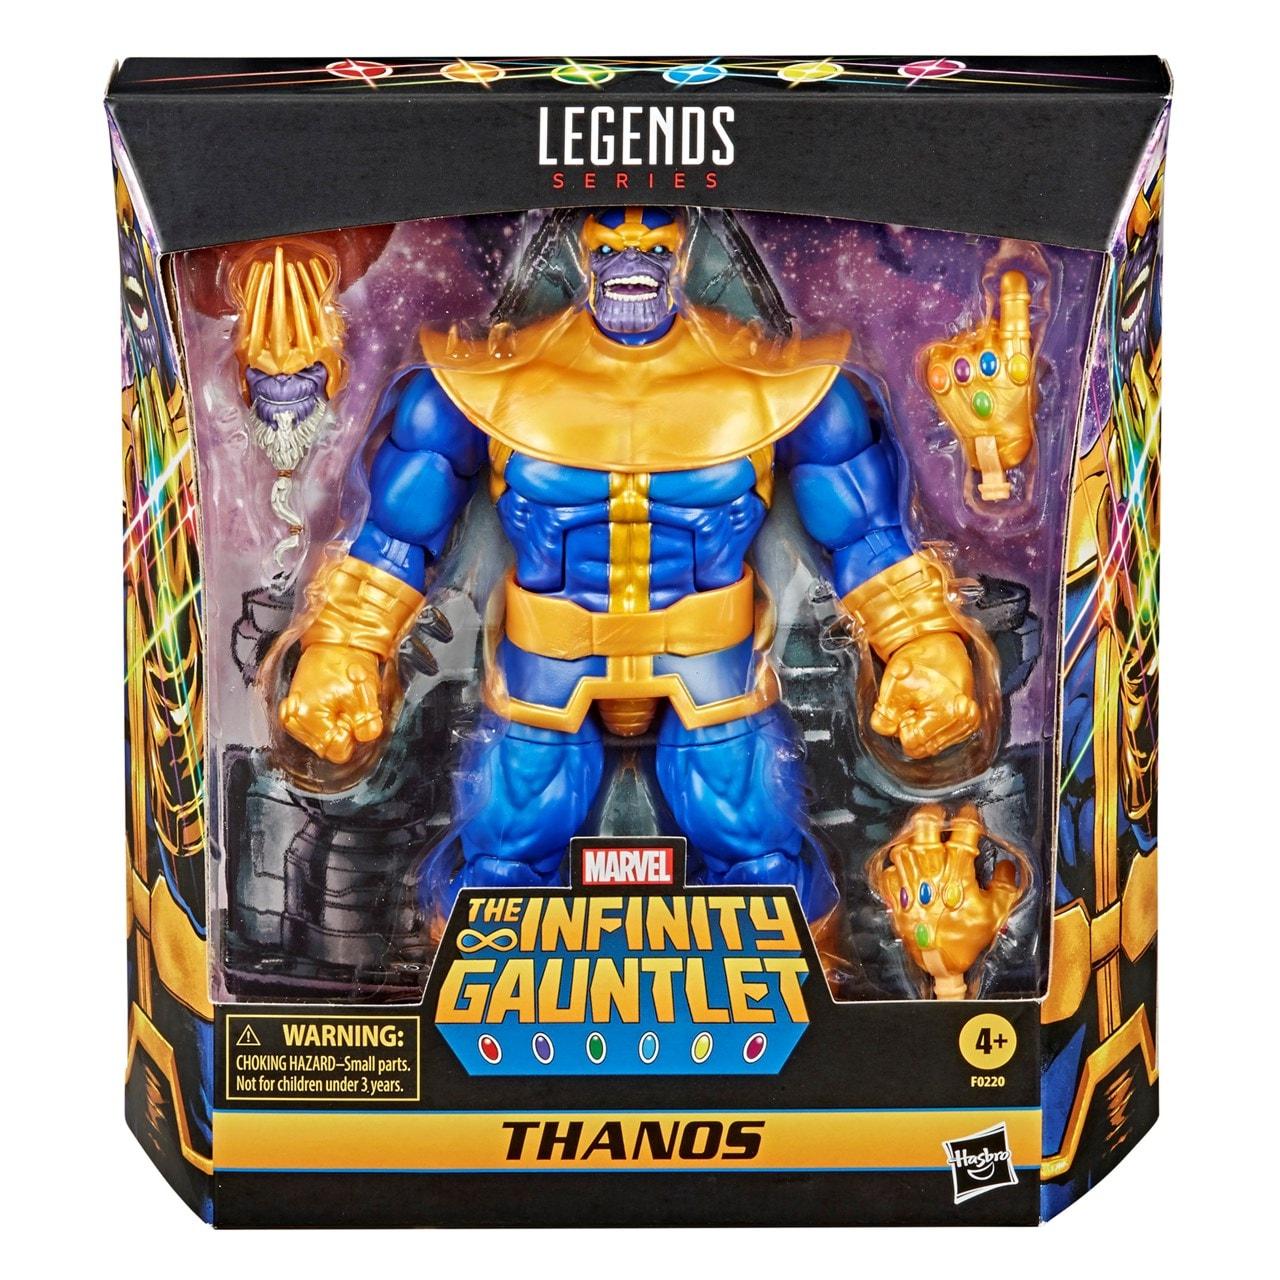 Thanos: Infinity Gauntlet: Legends Series Marvel Action Figure - 2